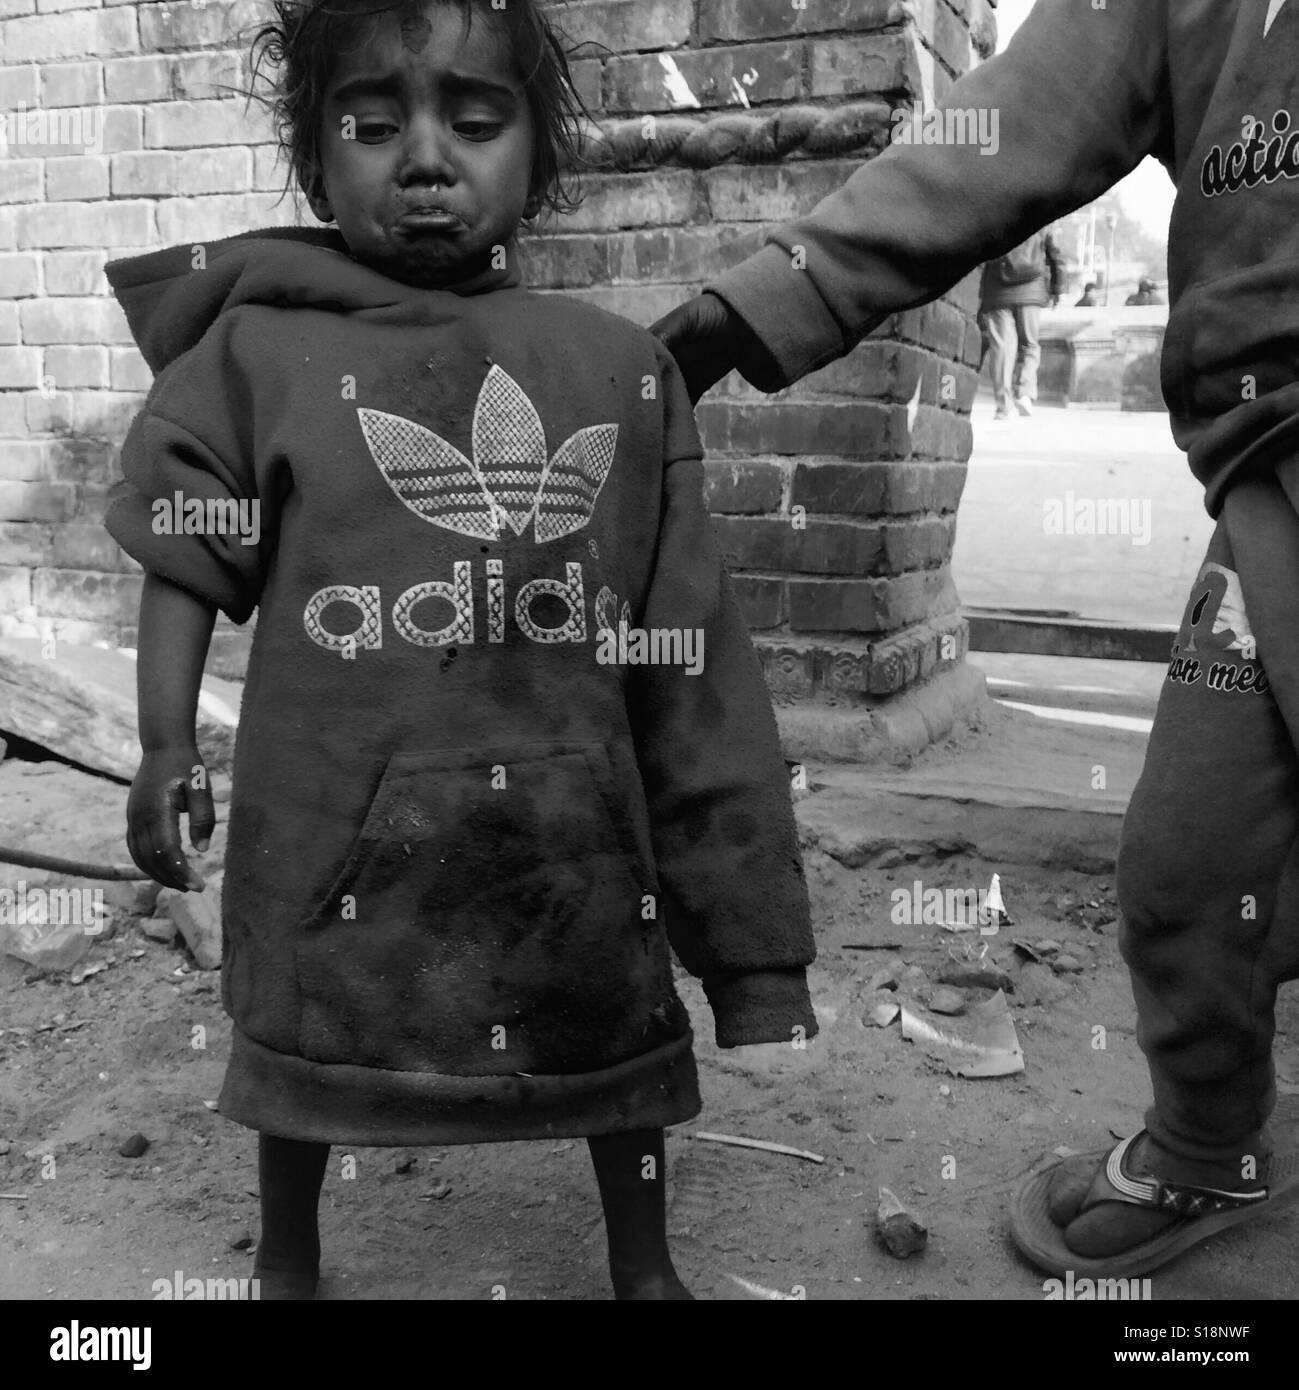 Little girl in an adidas top, Kathmandu - Stock Image